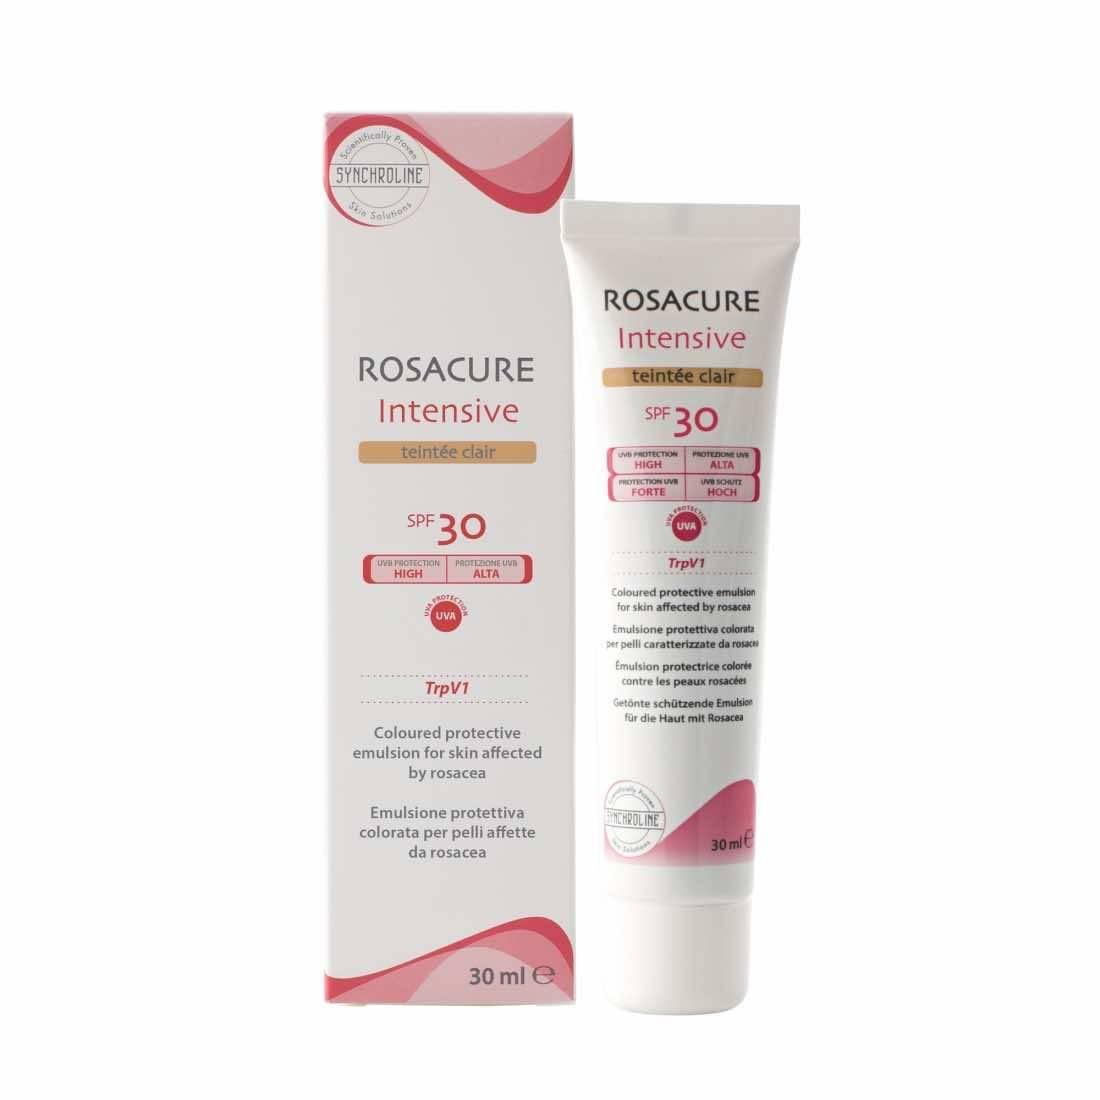 Synchroline Rosacure Intensive Spf 30